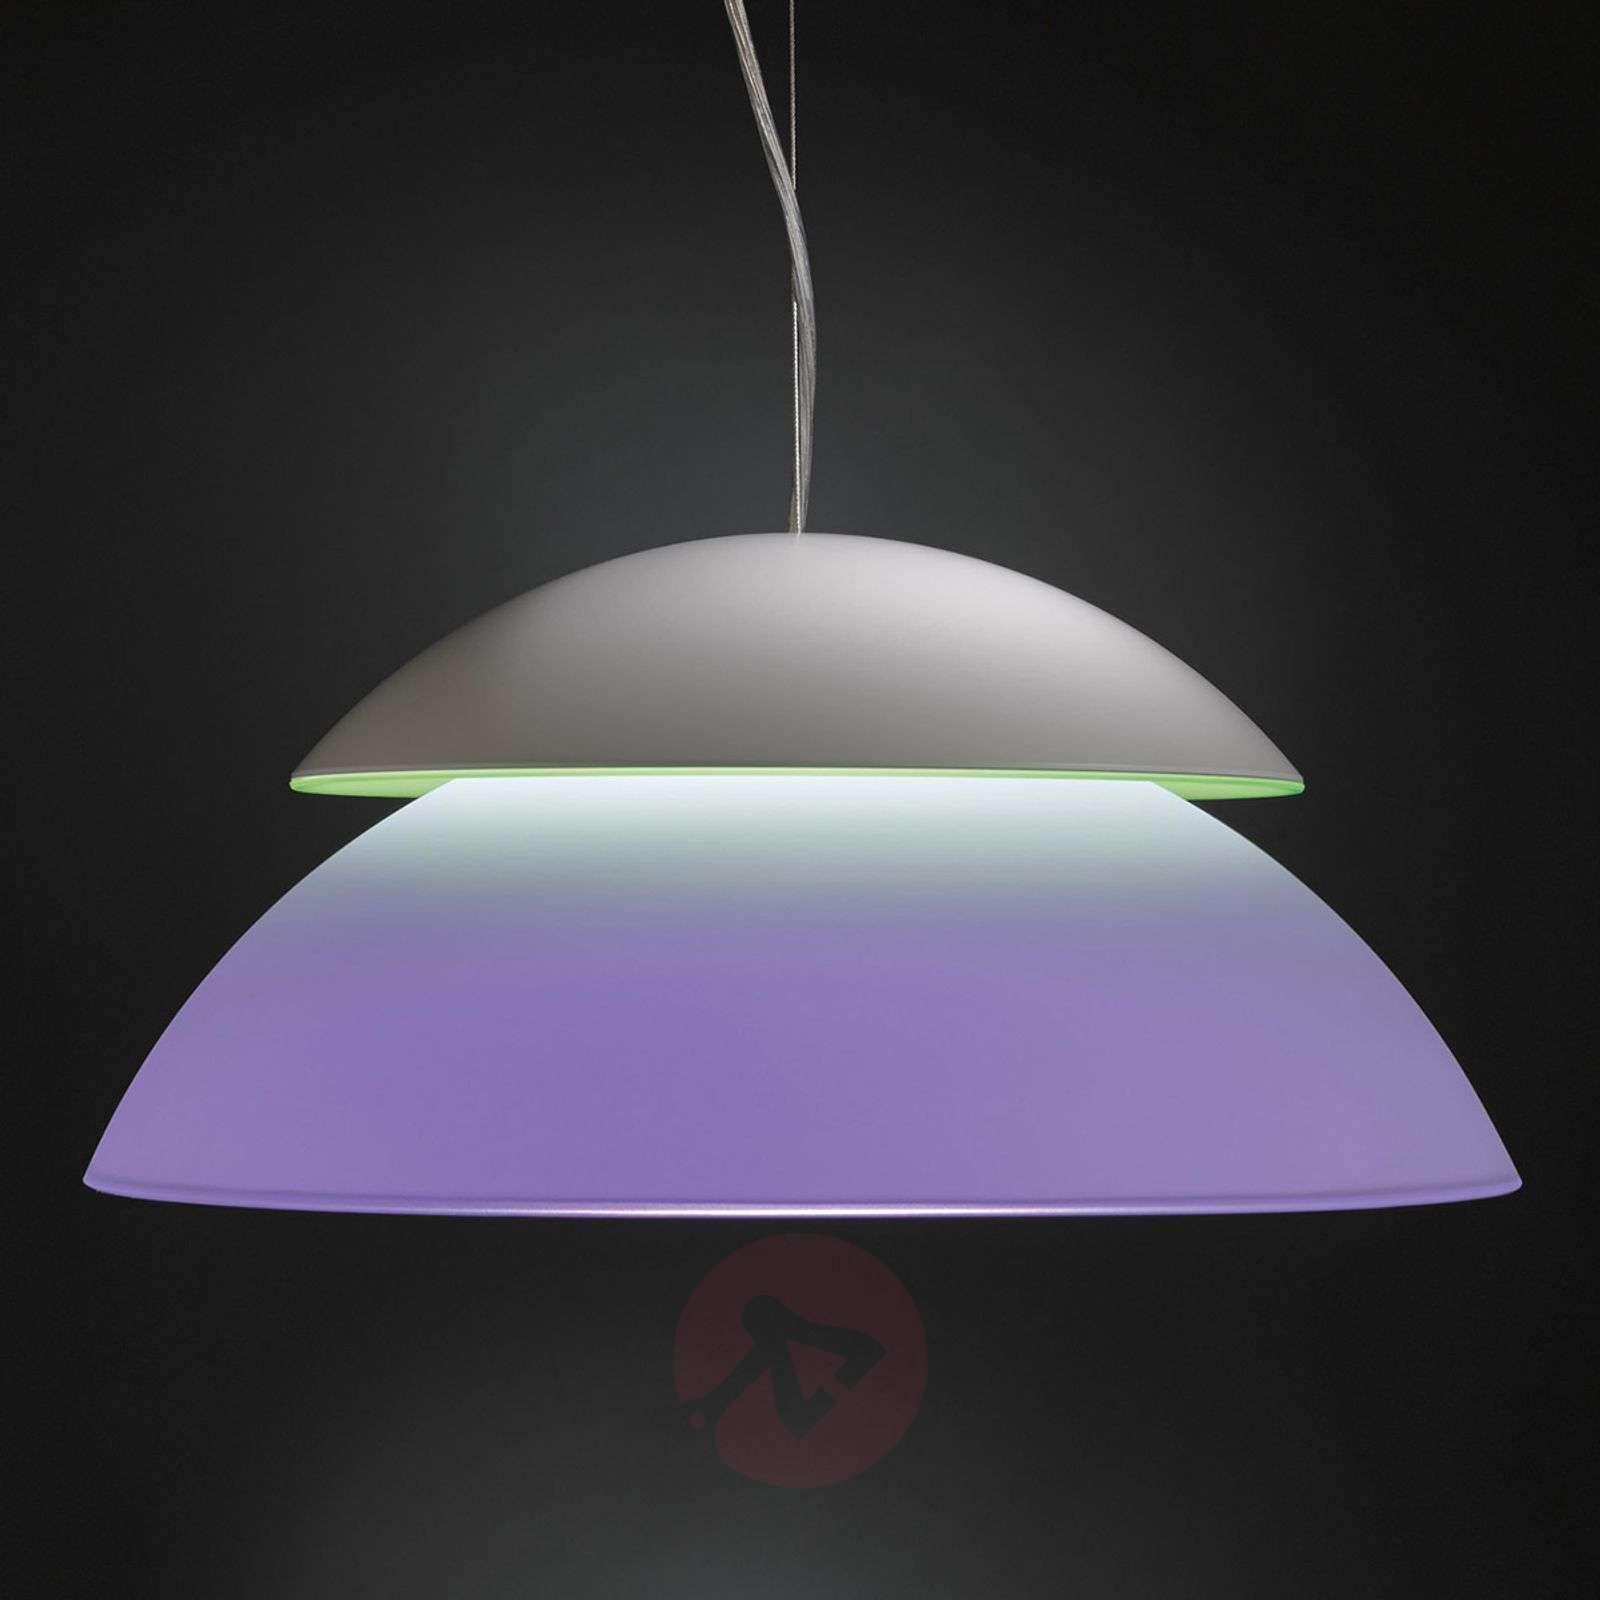 Philips Hue Beyond pendant light-7531598-01